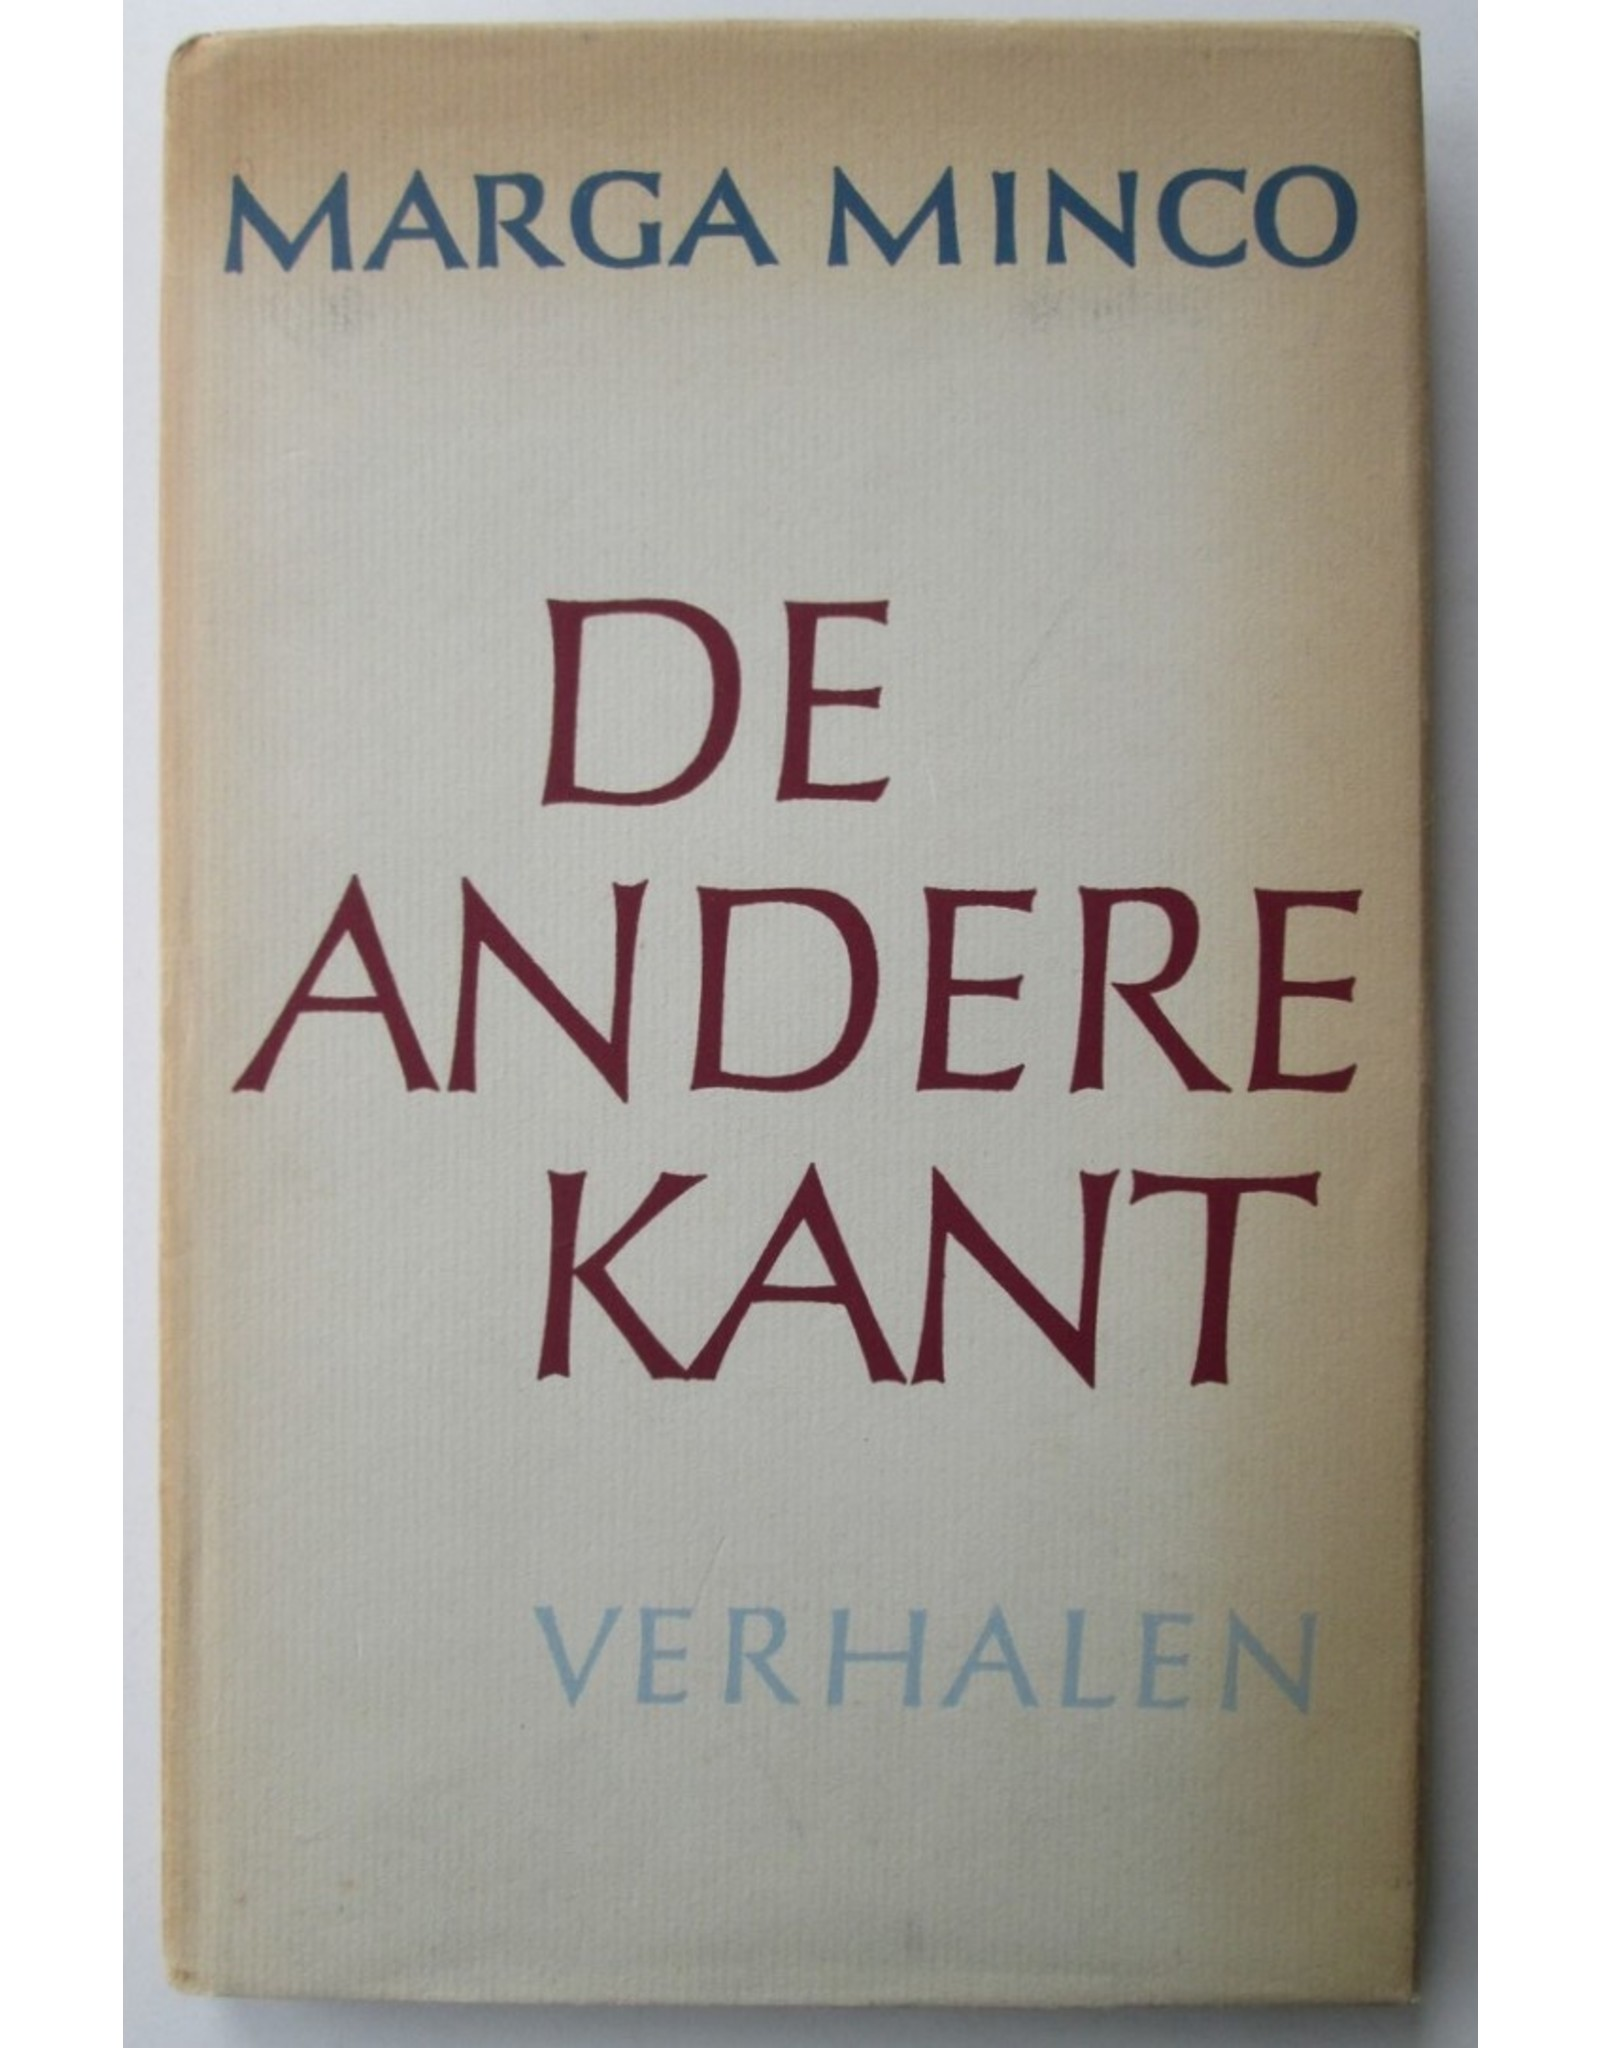 Marga Minco - De andere kant. Verhalen